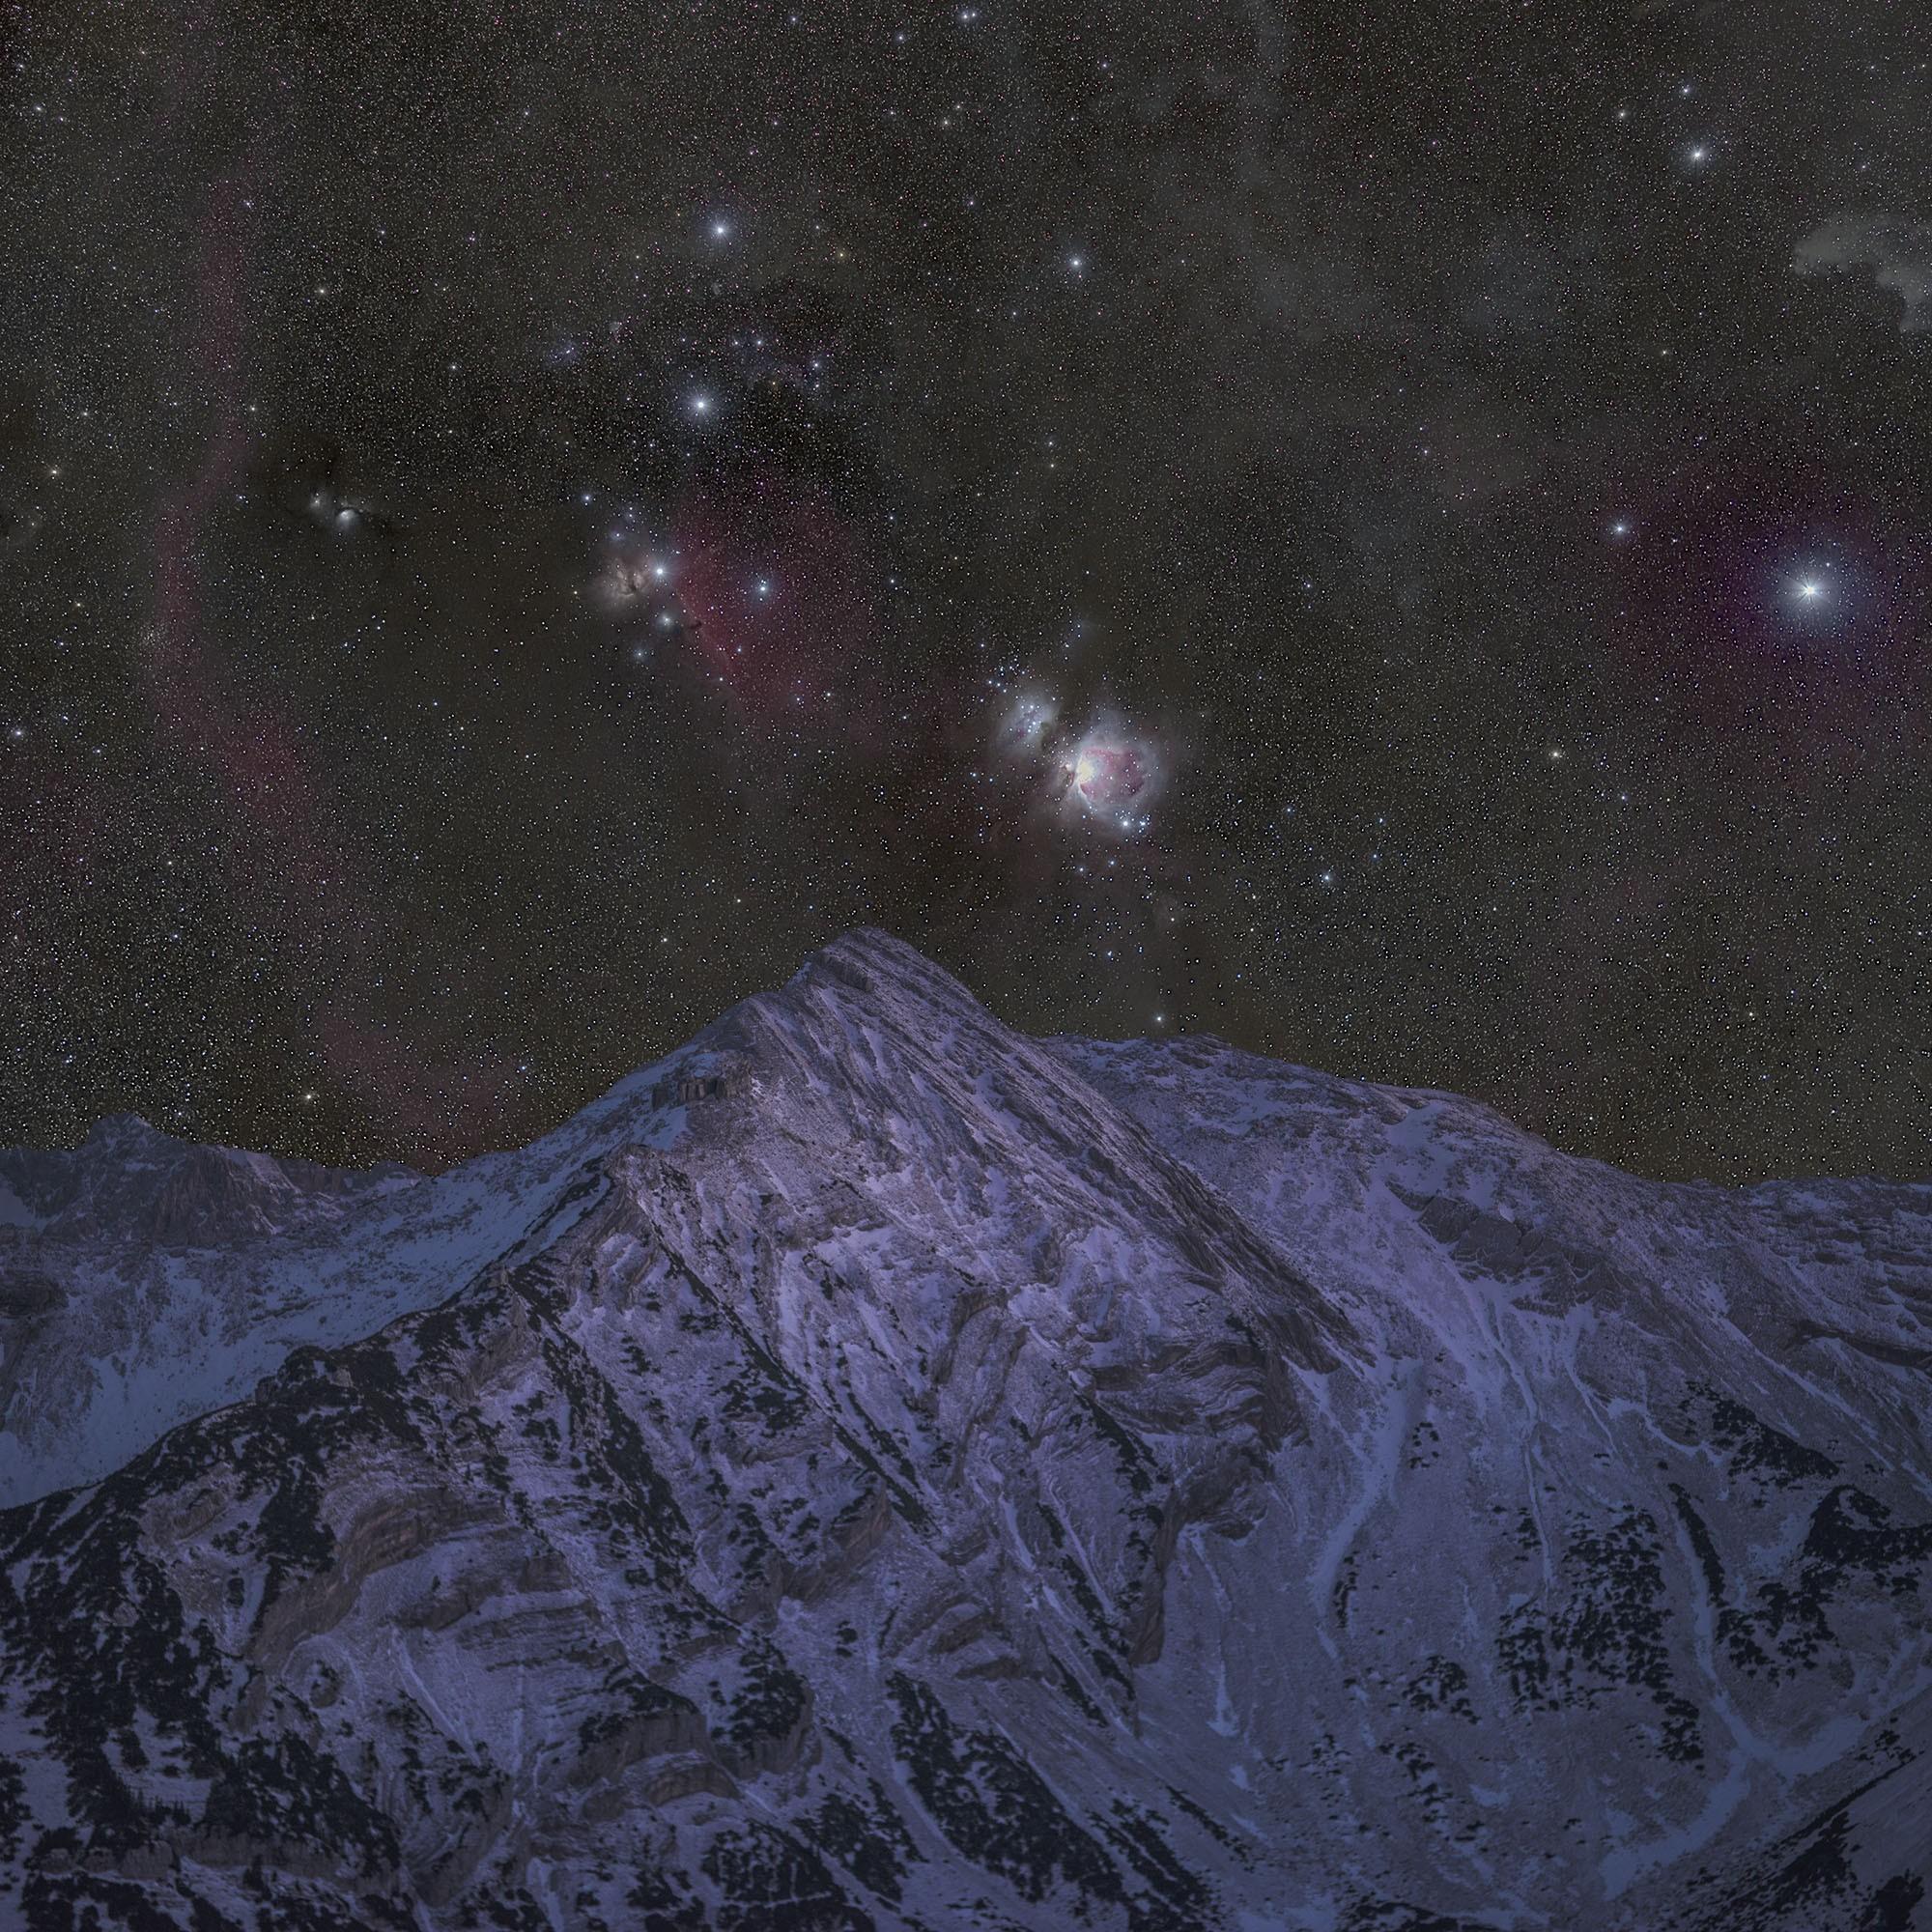 Deep Sky Edition! Star des Winterhimmels - Aufgang des Orionnebels an der Krapfenkarspitze im Soierngebirge.